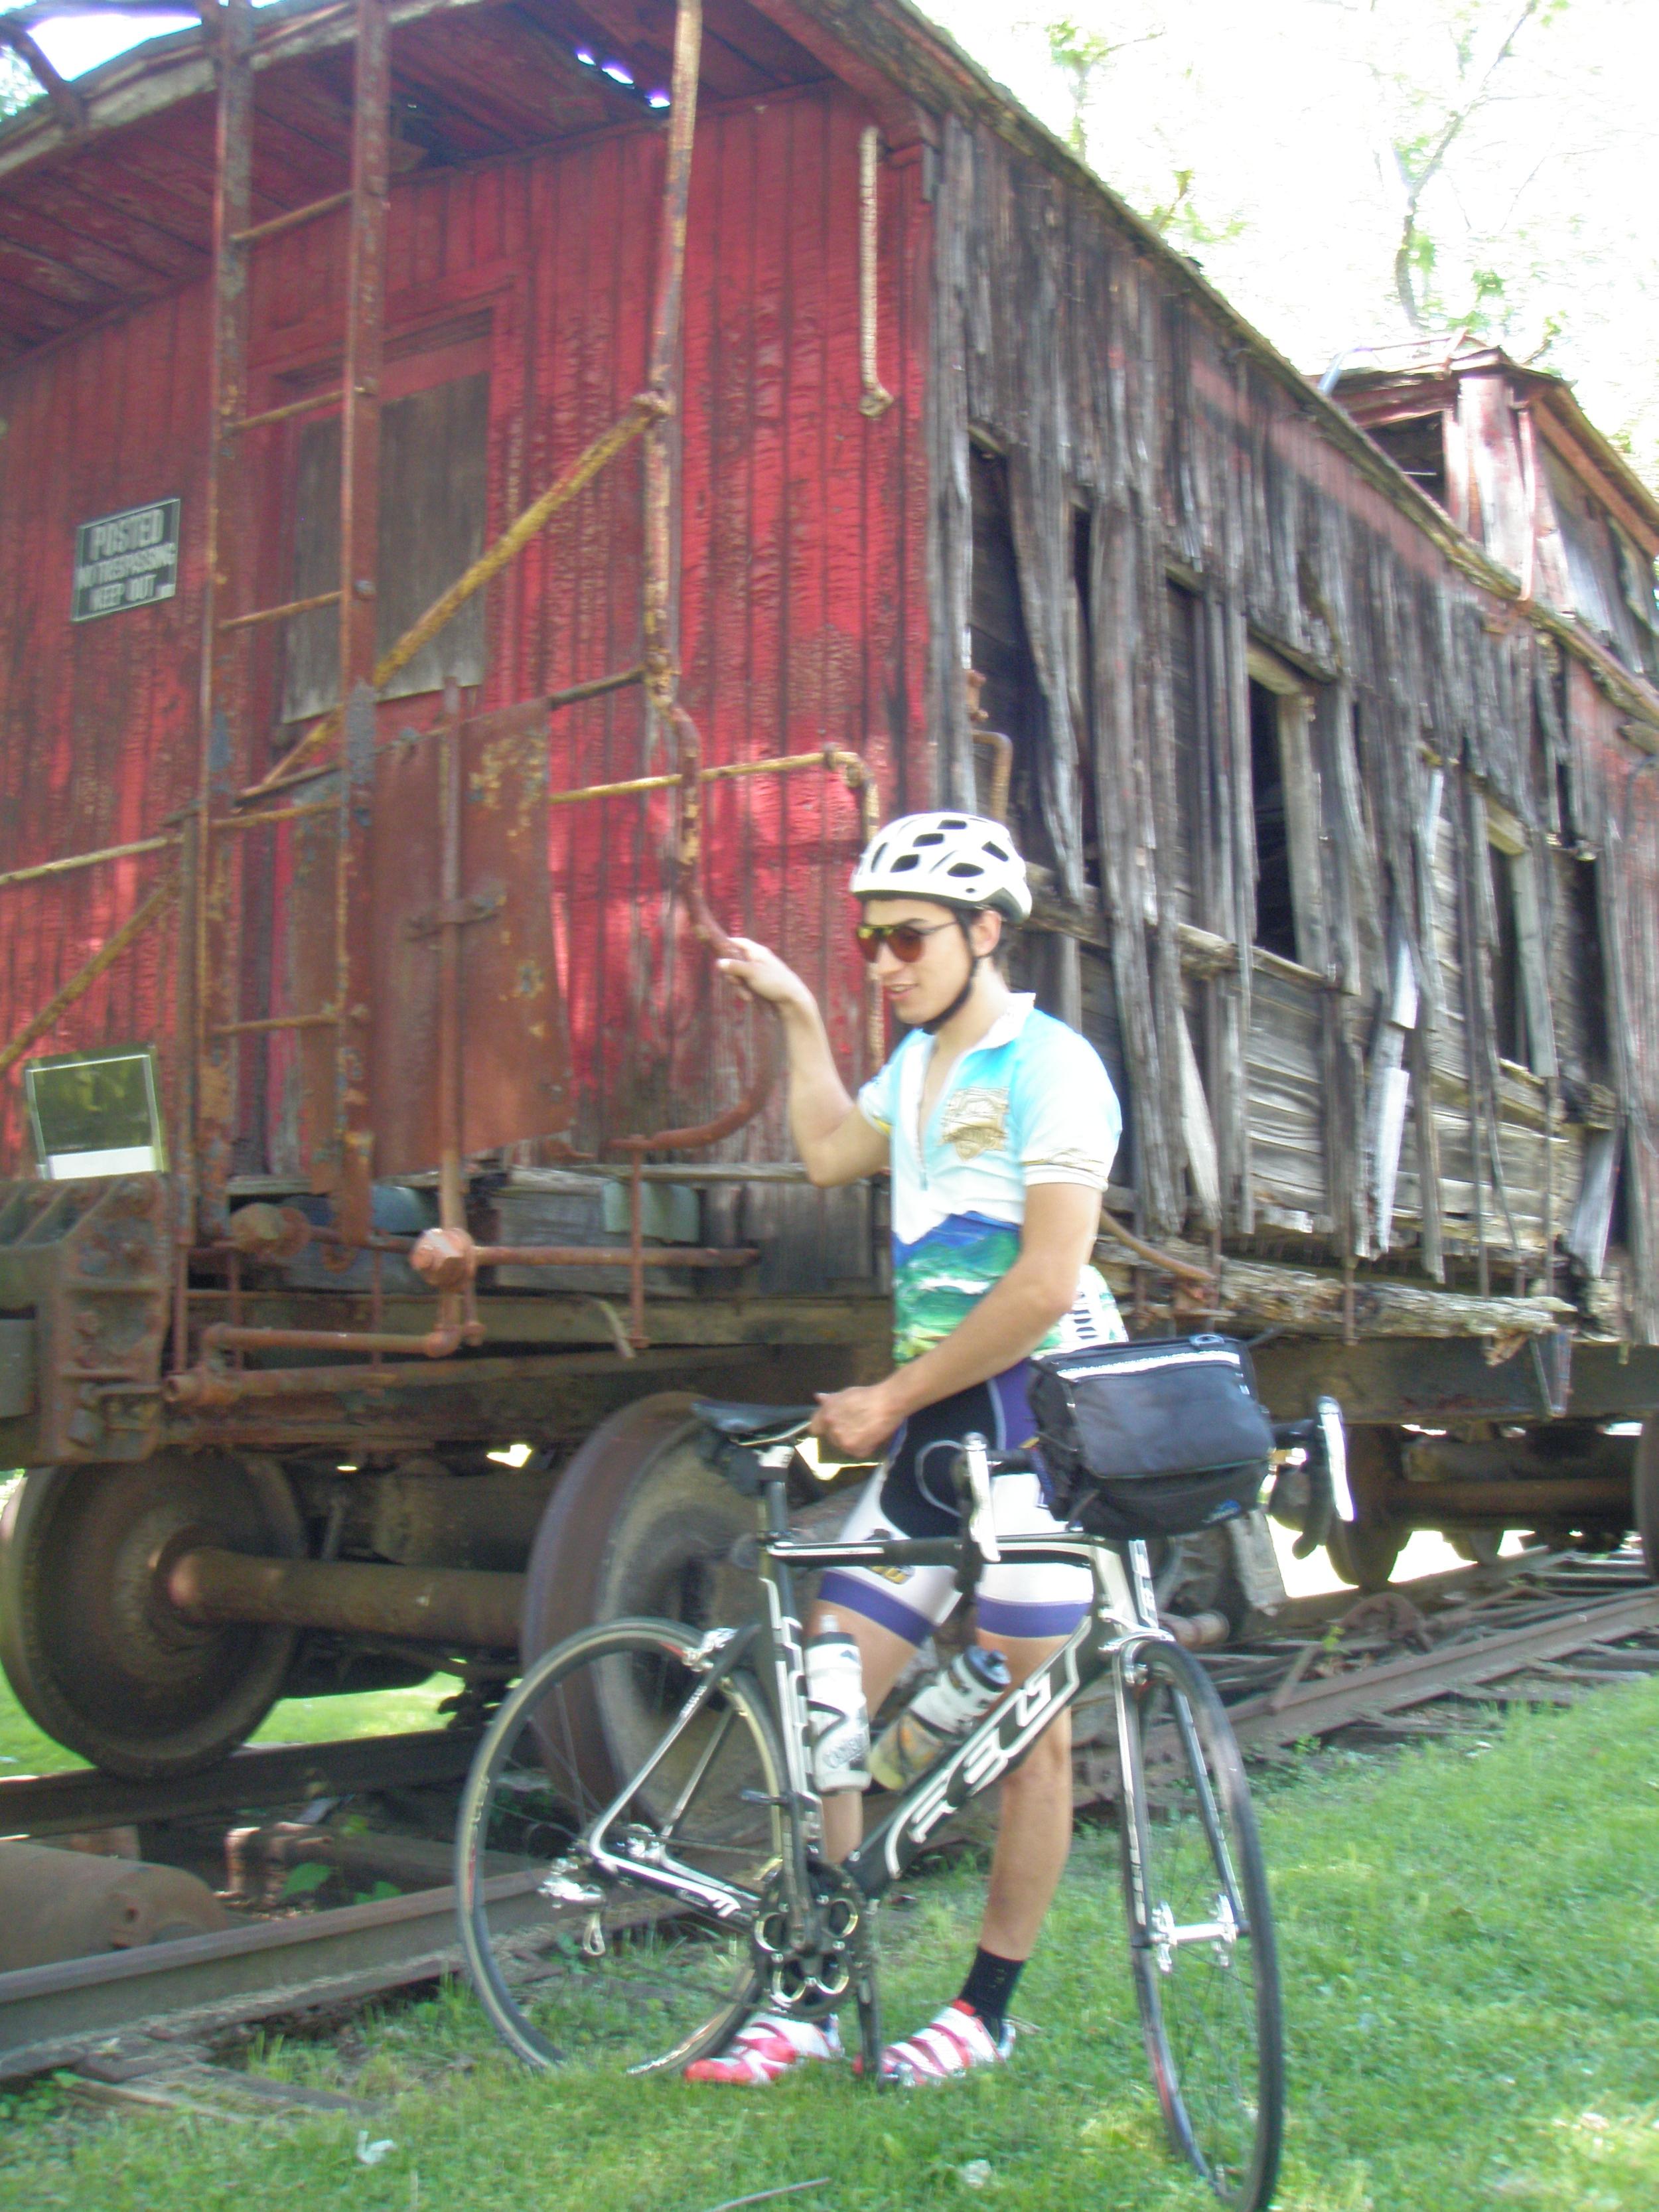 Found an old train car